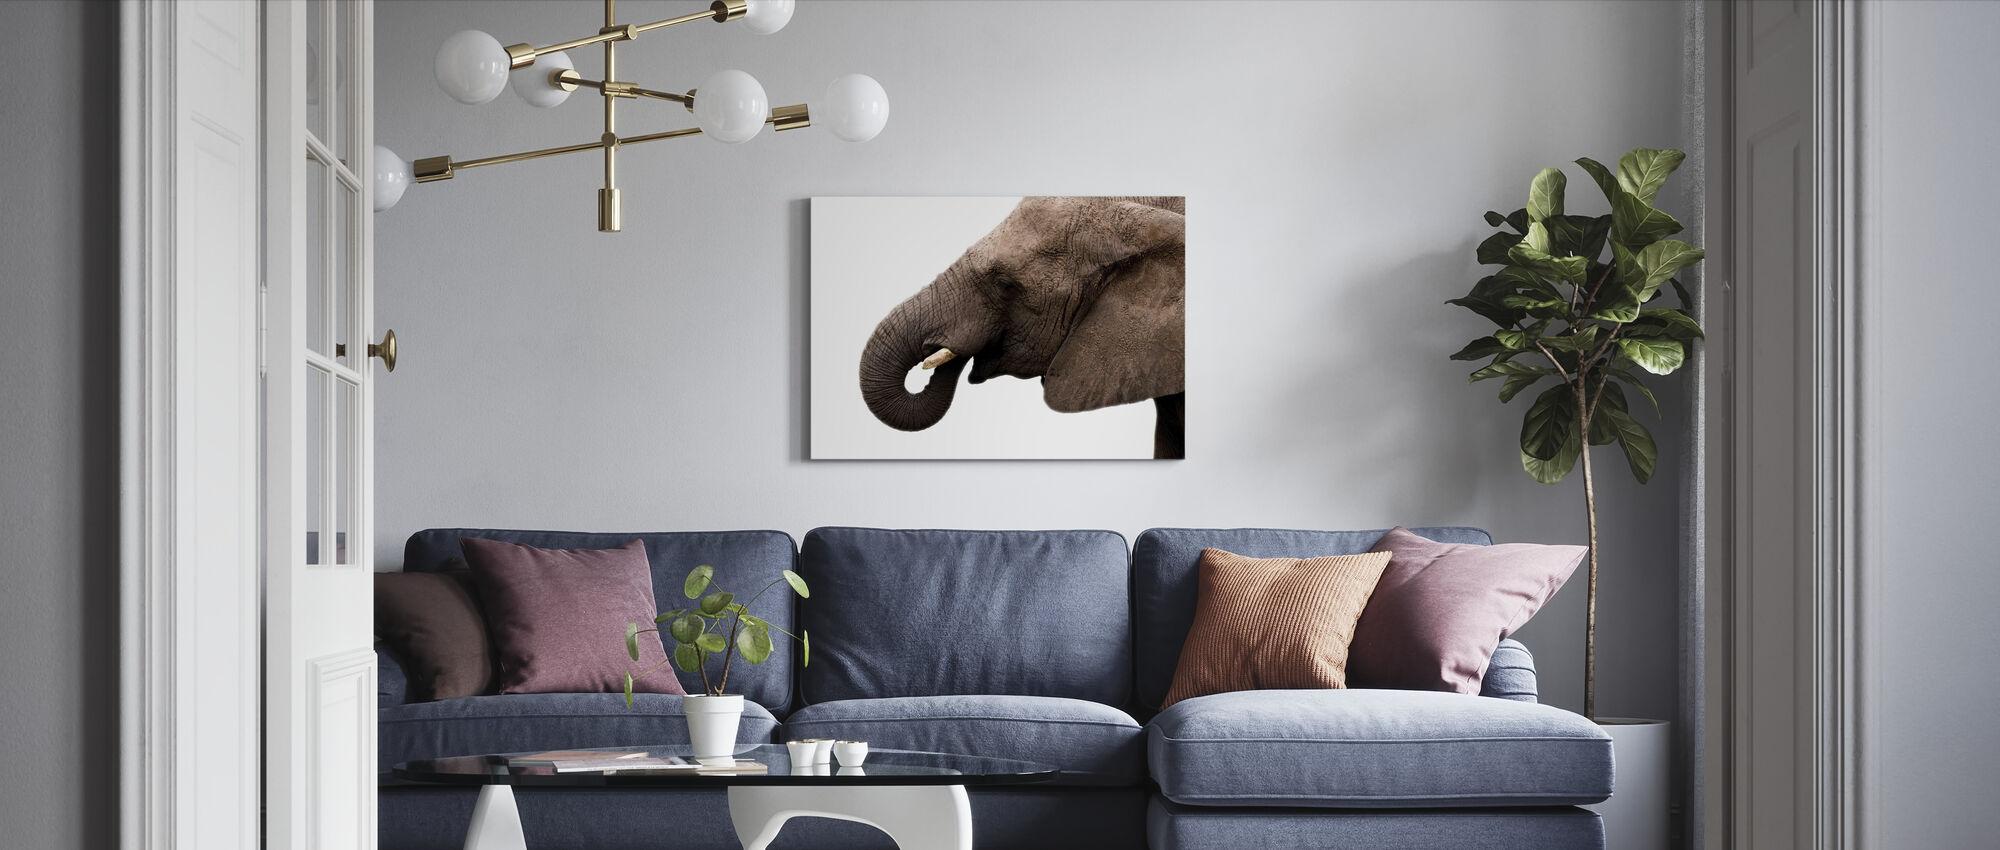 Mr Trunk - Canvas print - Living Room